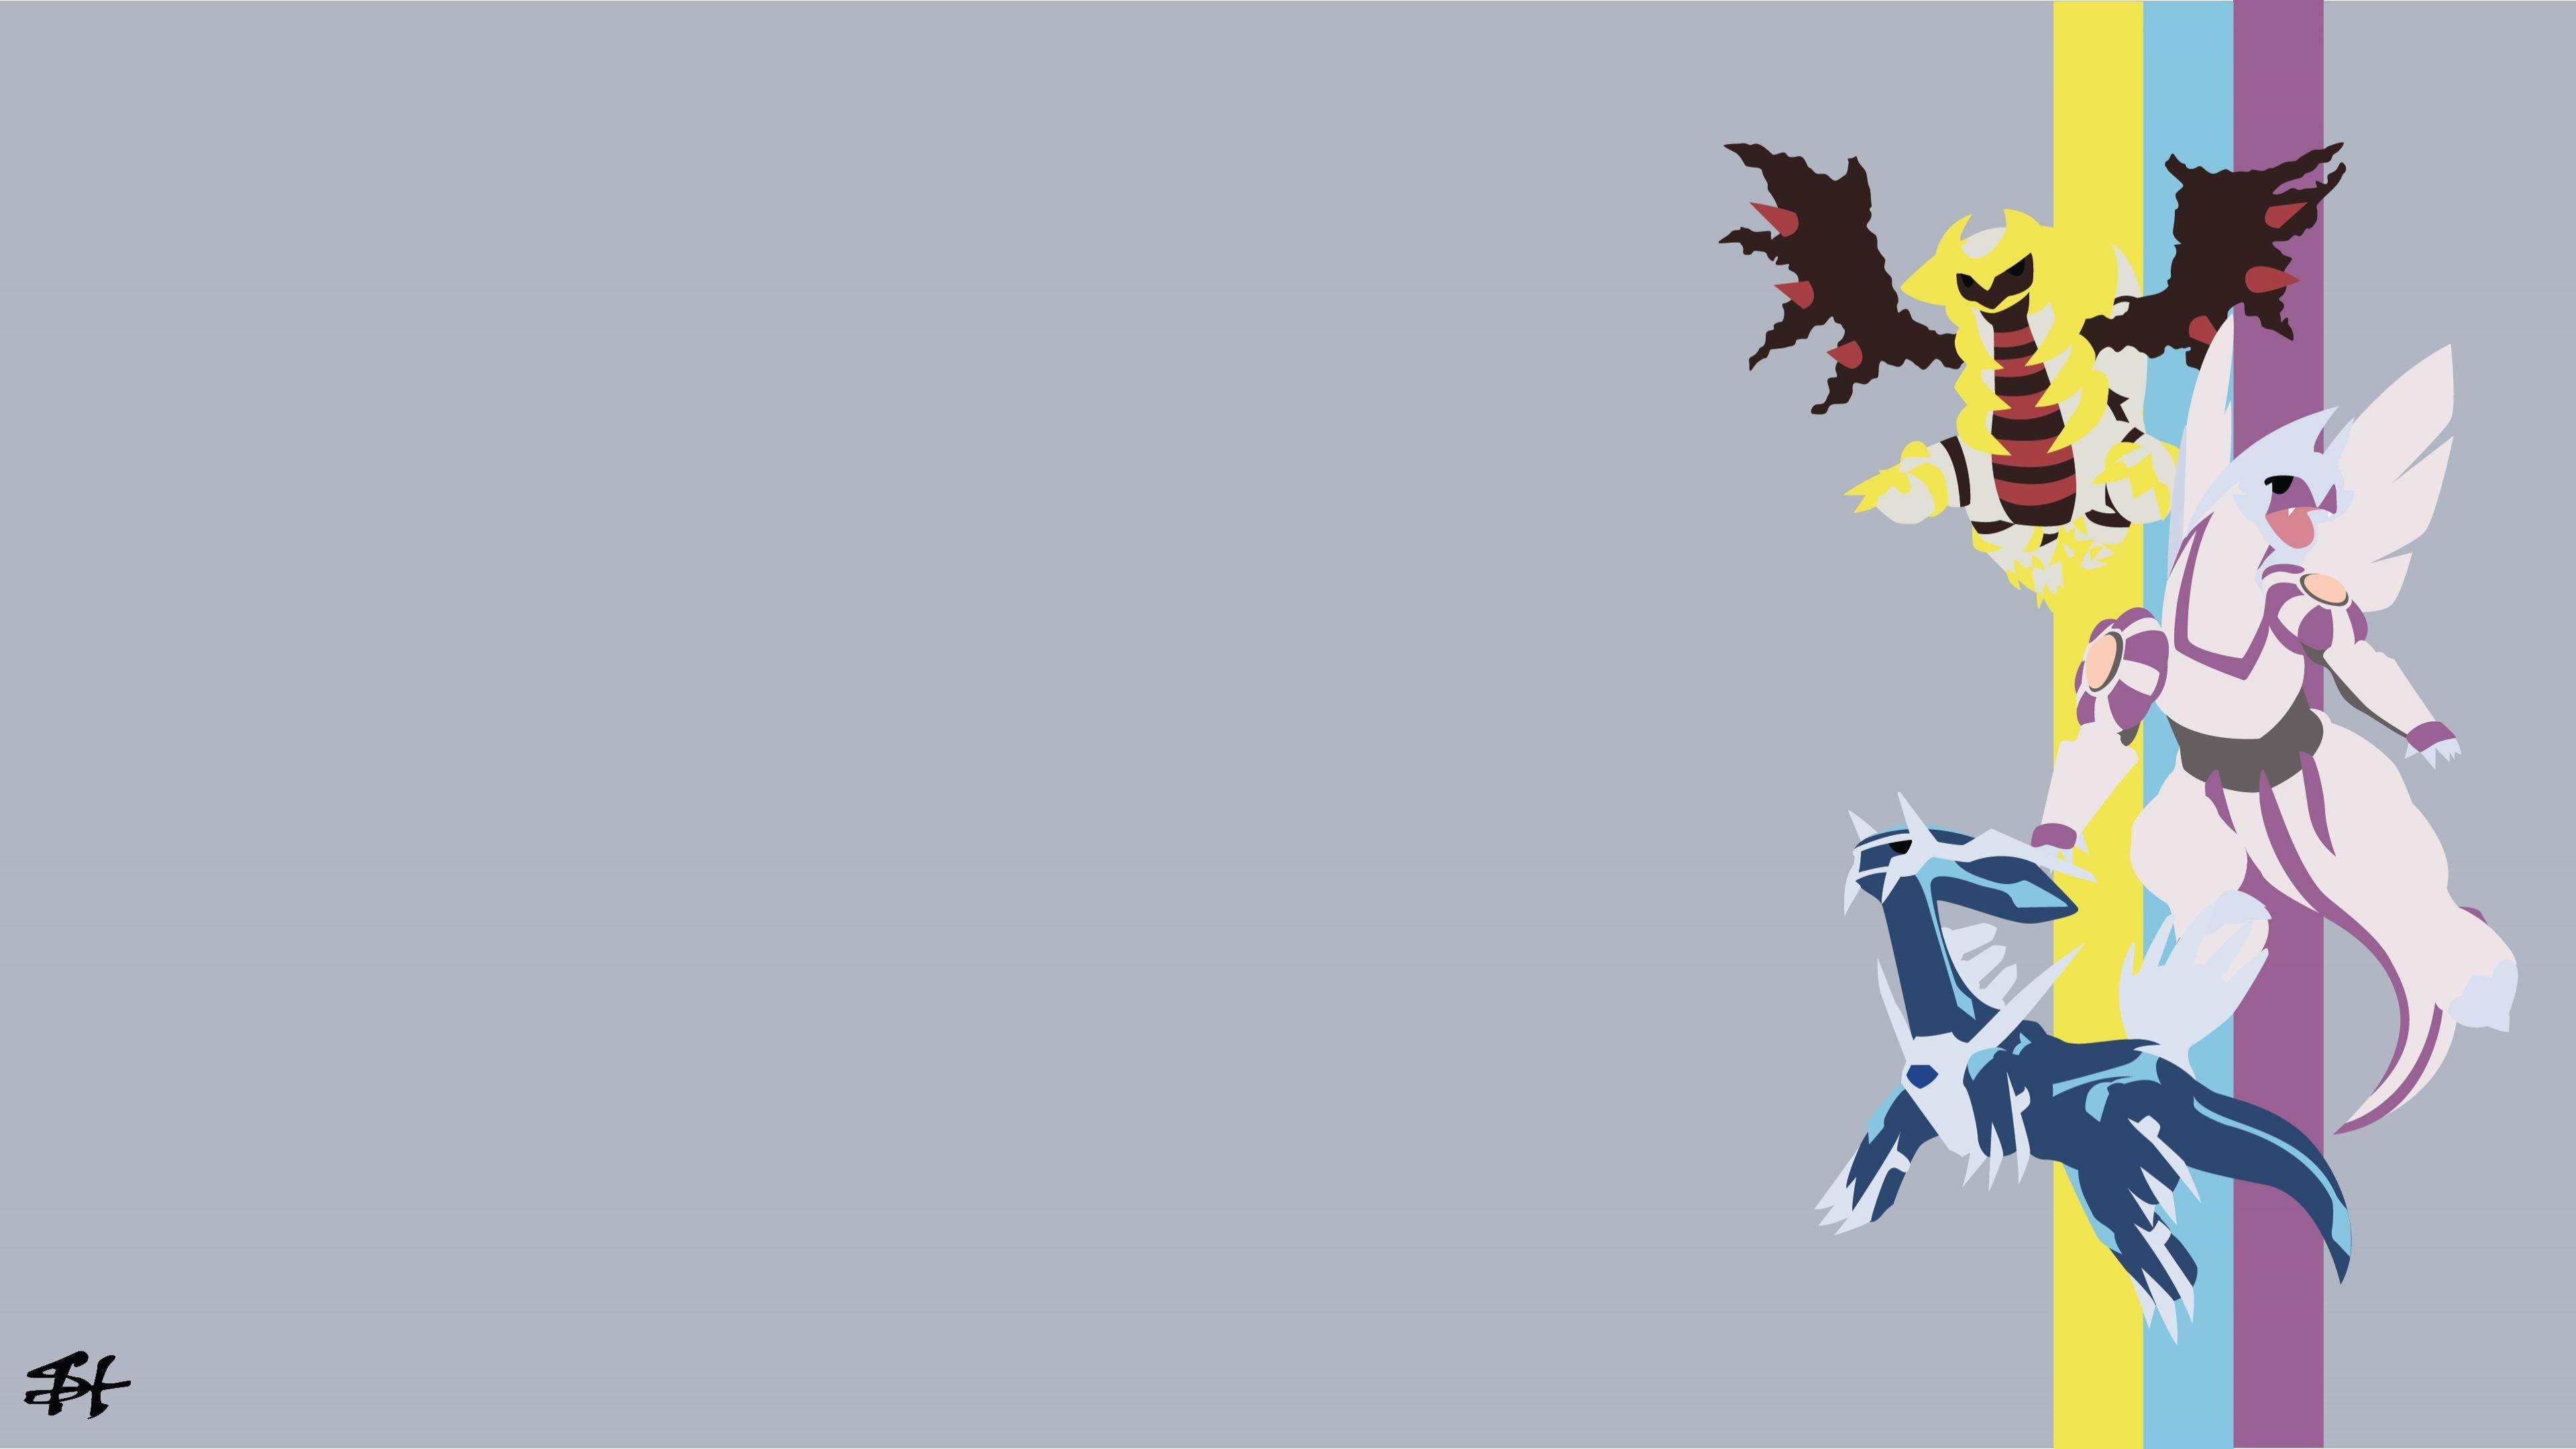 Awesome Giratina Pokemon Free Wallpaper Id 279187 For Ultra Hd 4k